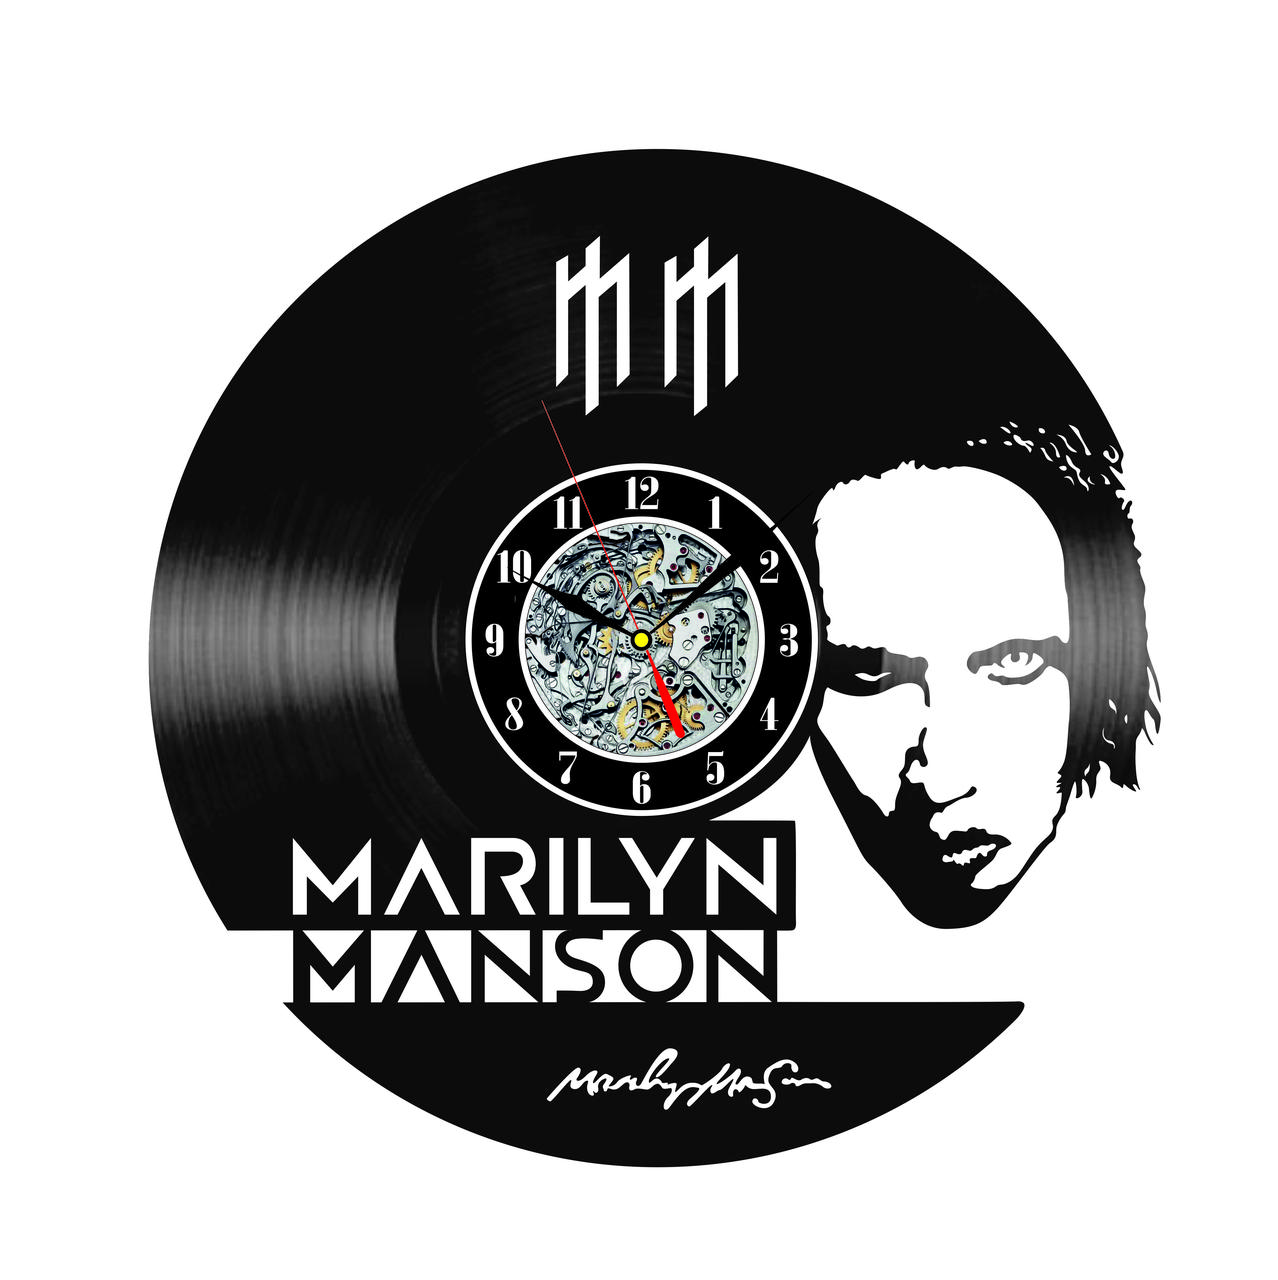 Настенные часы из виниловых пластинок LikeMark Marilyn Manson